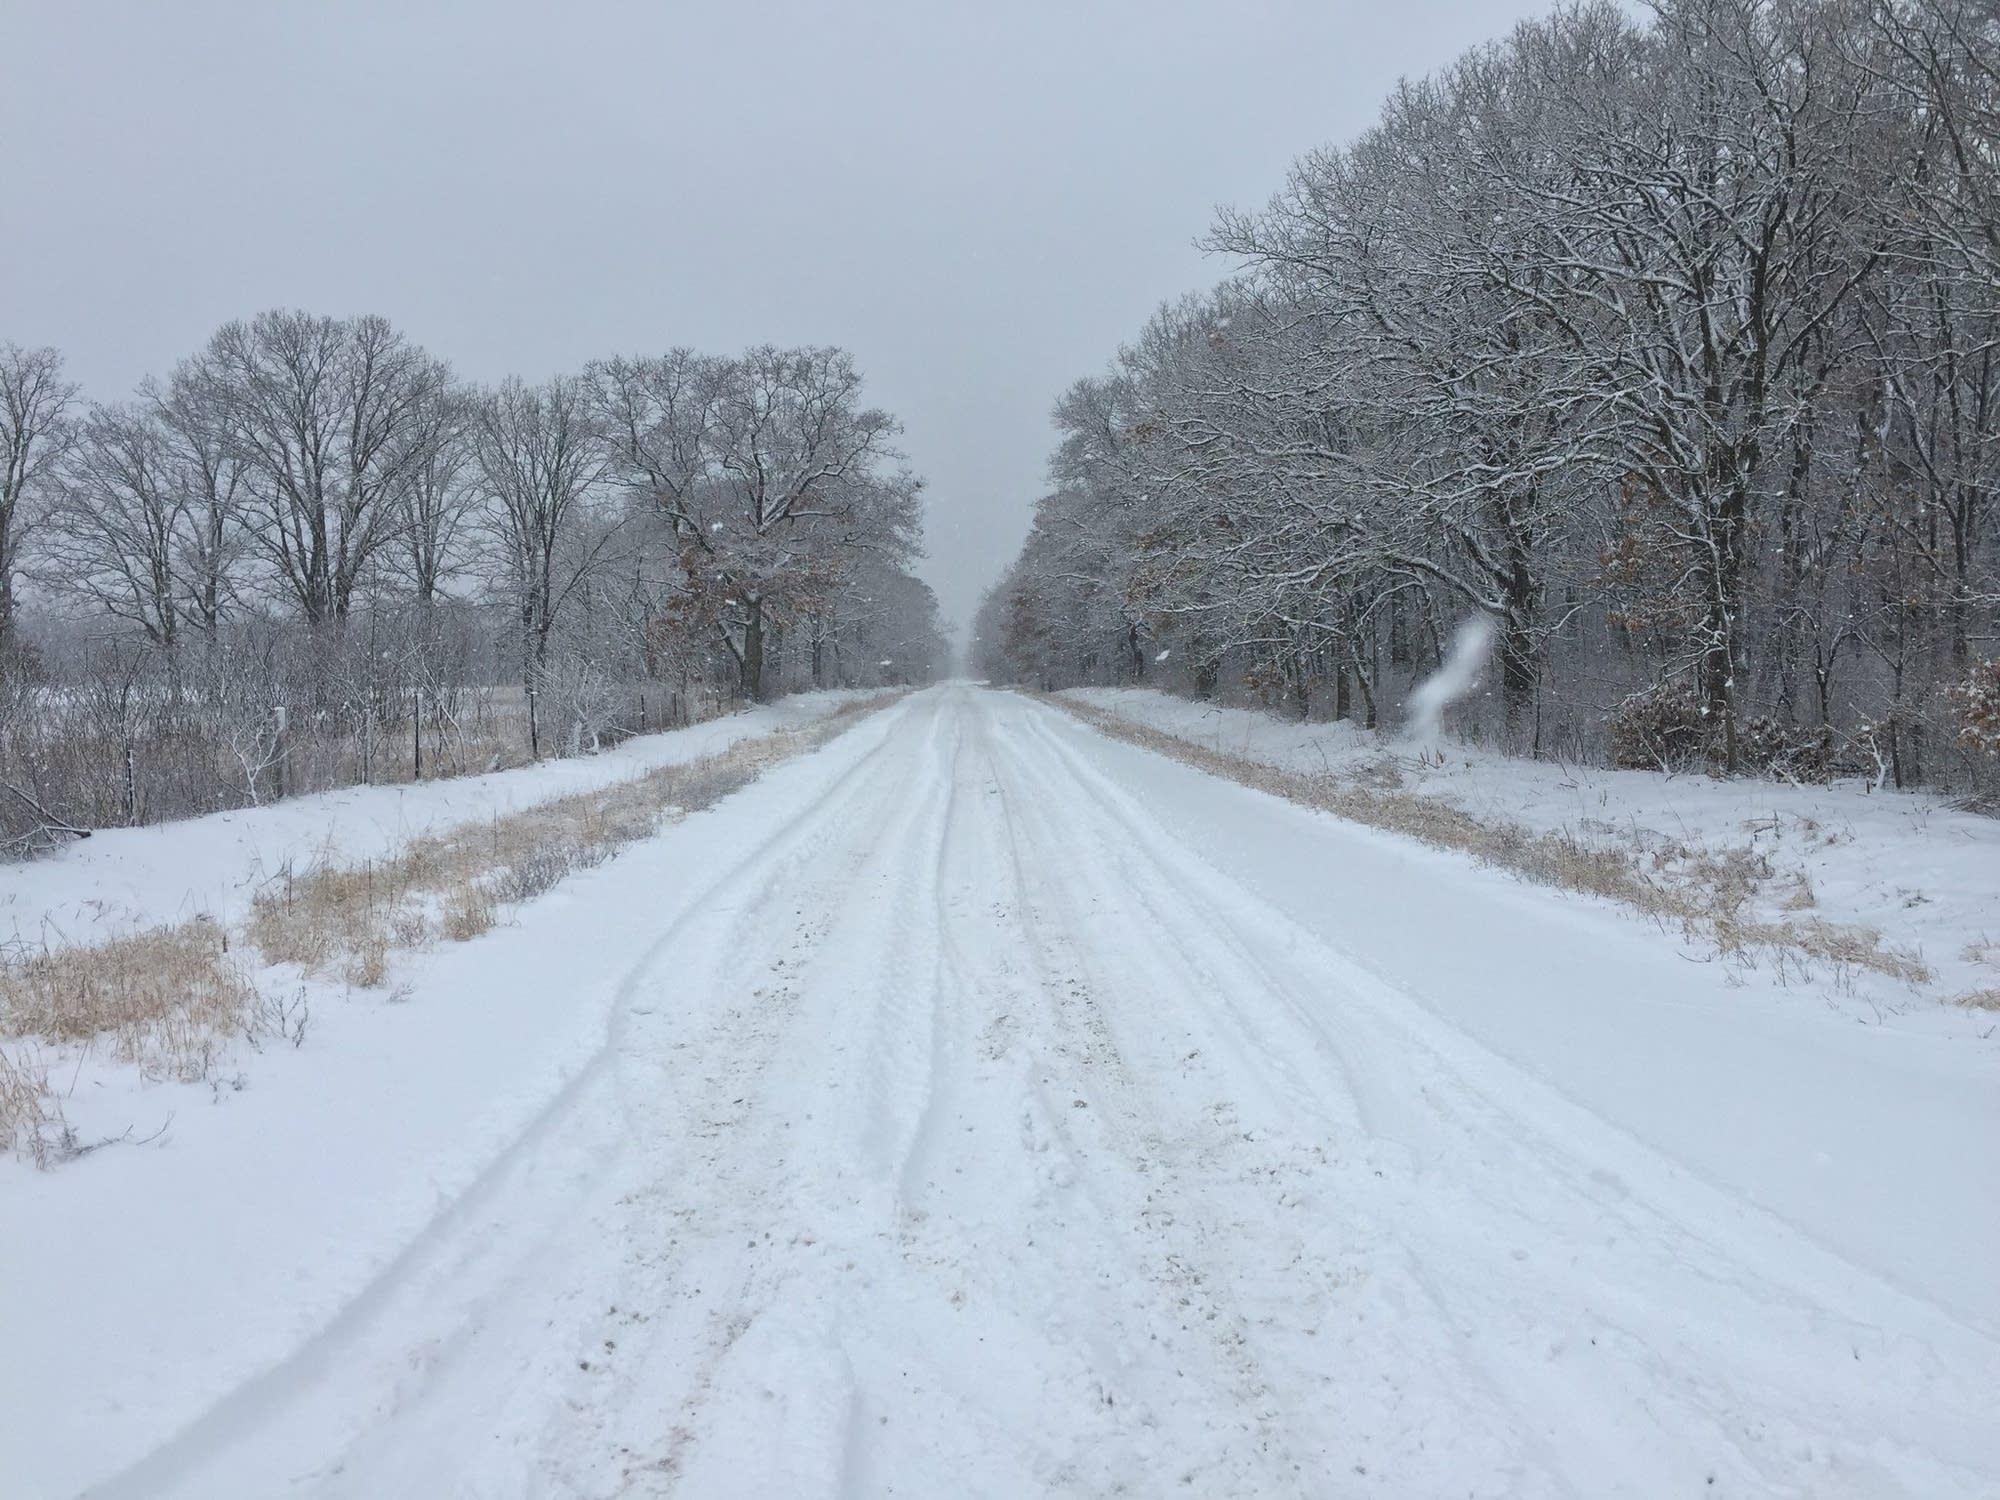 A snowy scene near Fort Ripley, Minn.